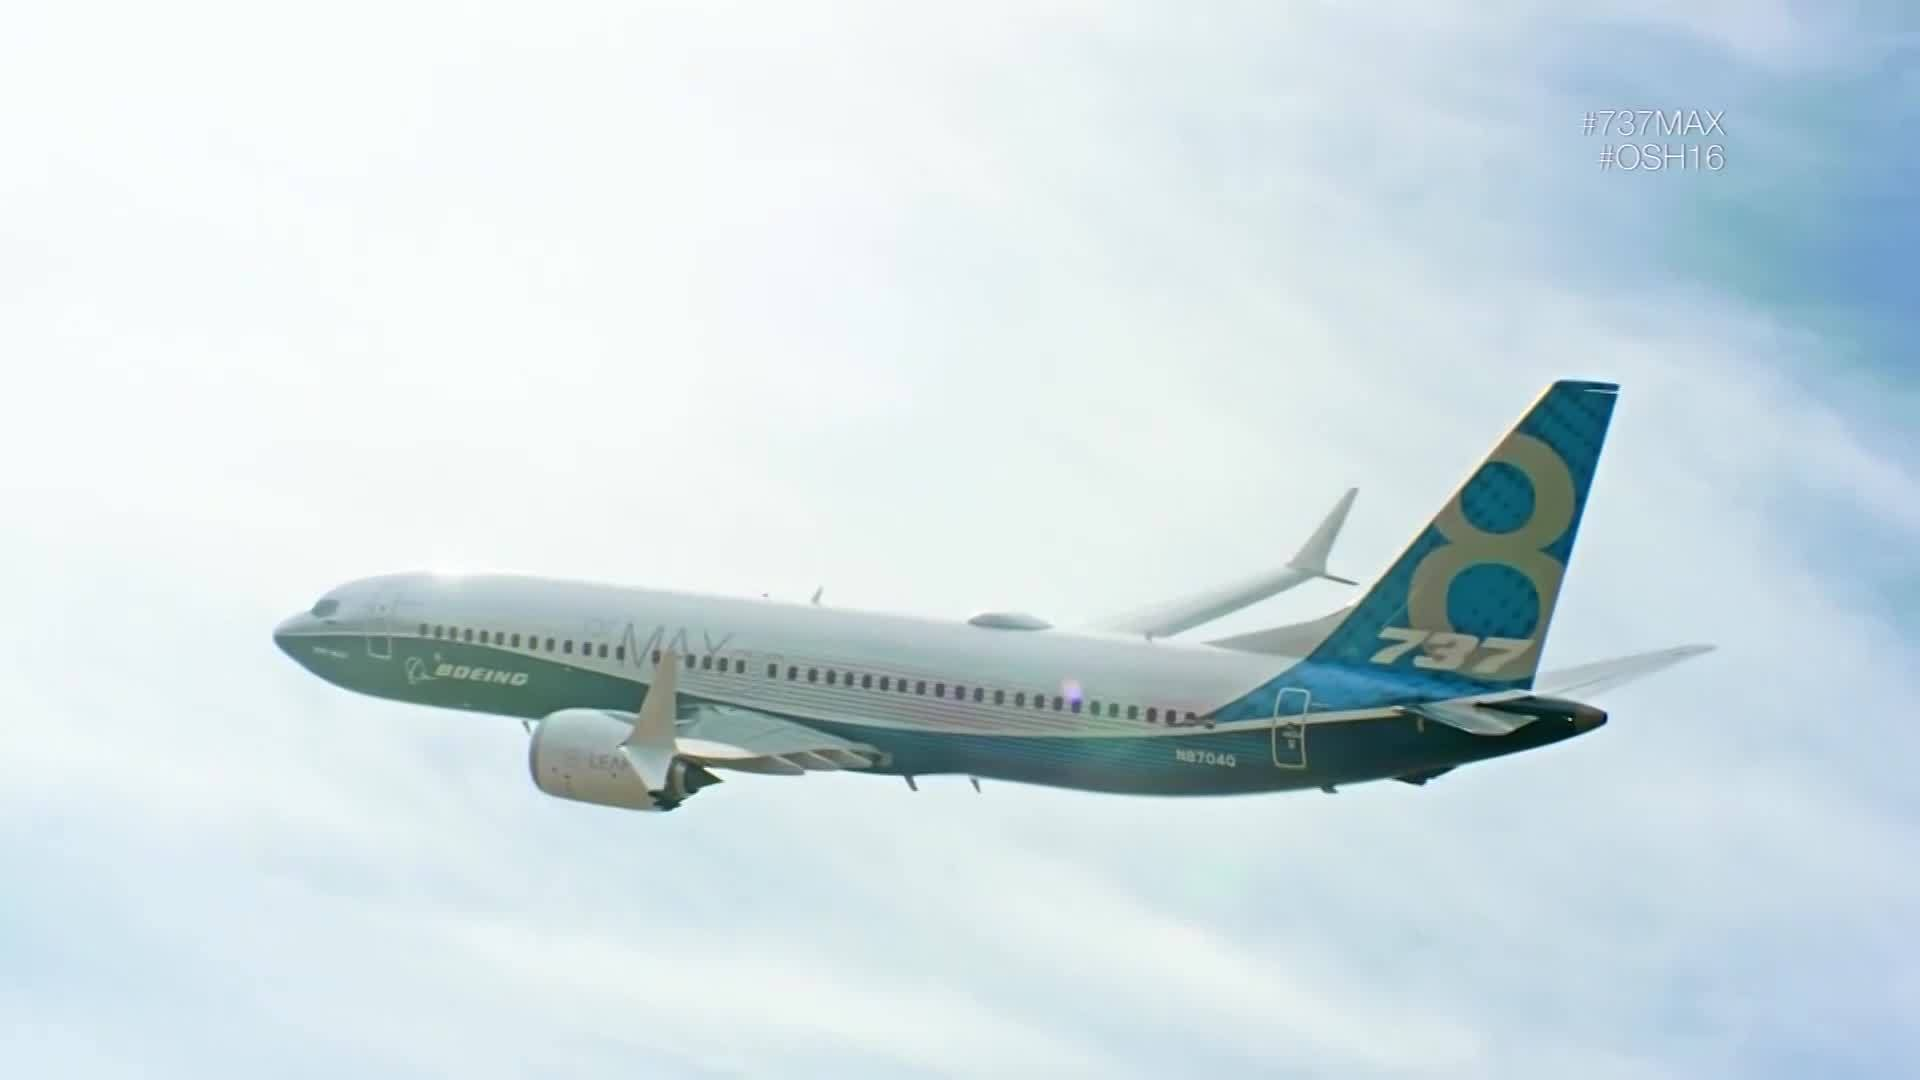 Boeing__FAA_at_center_of_Congress_hearin_6_20190327225419